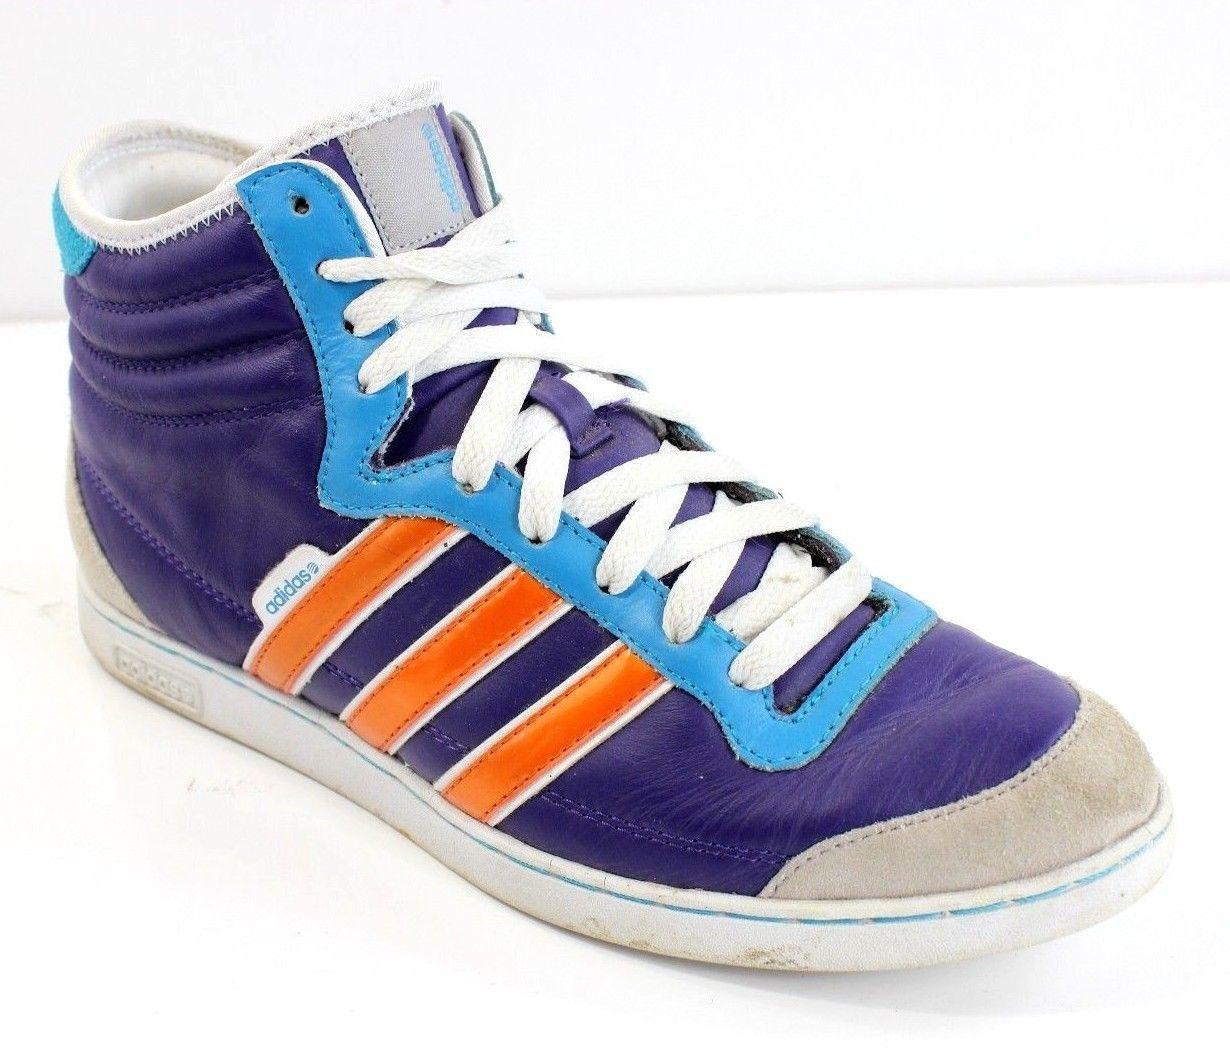 superior quality eca3d ec07d ... ebay adidas neo hi purple orange blue suede leather 3 stripe sneaker  shoes mens sz 9